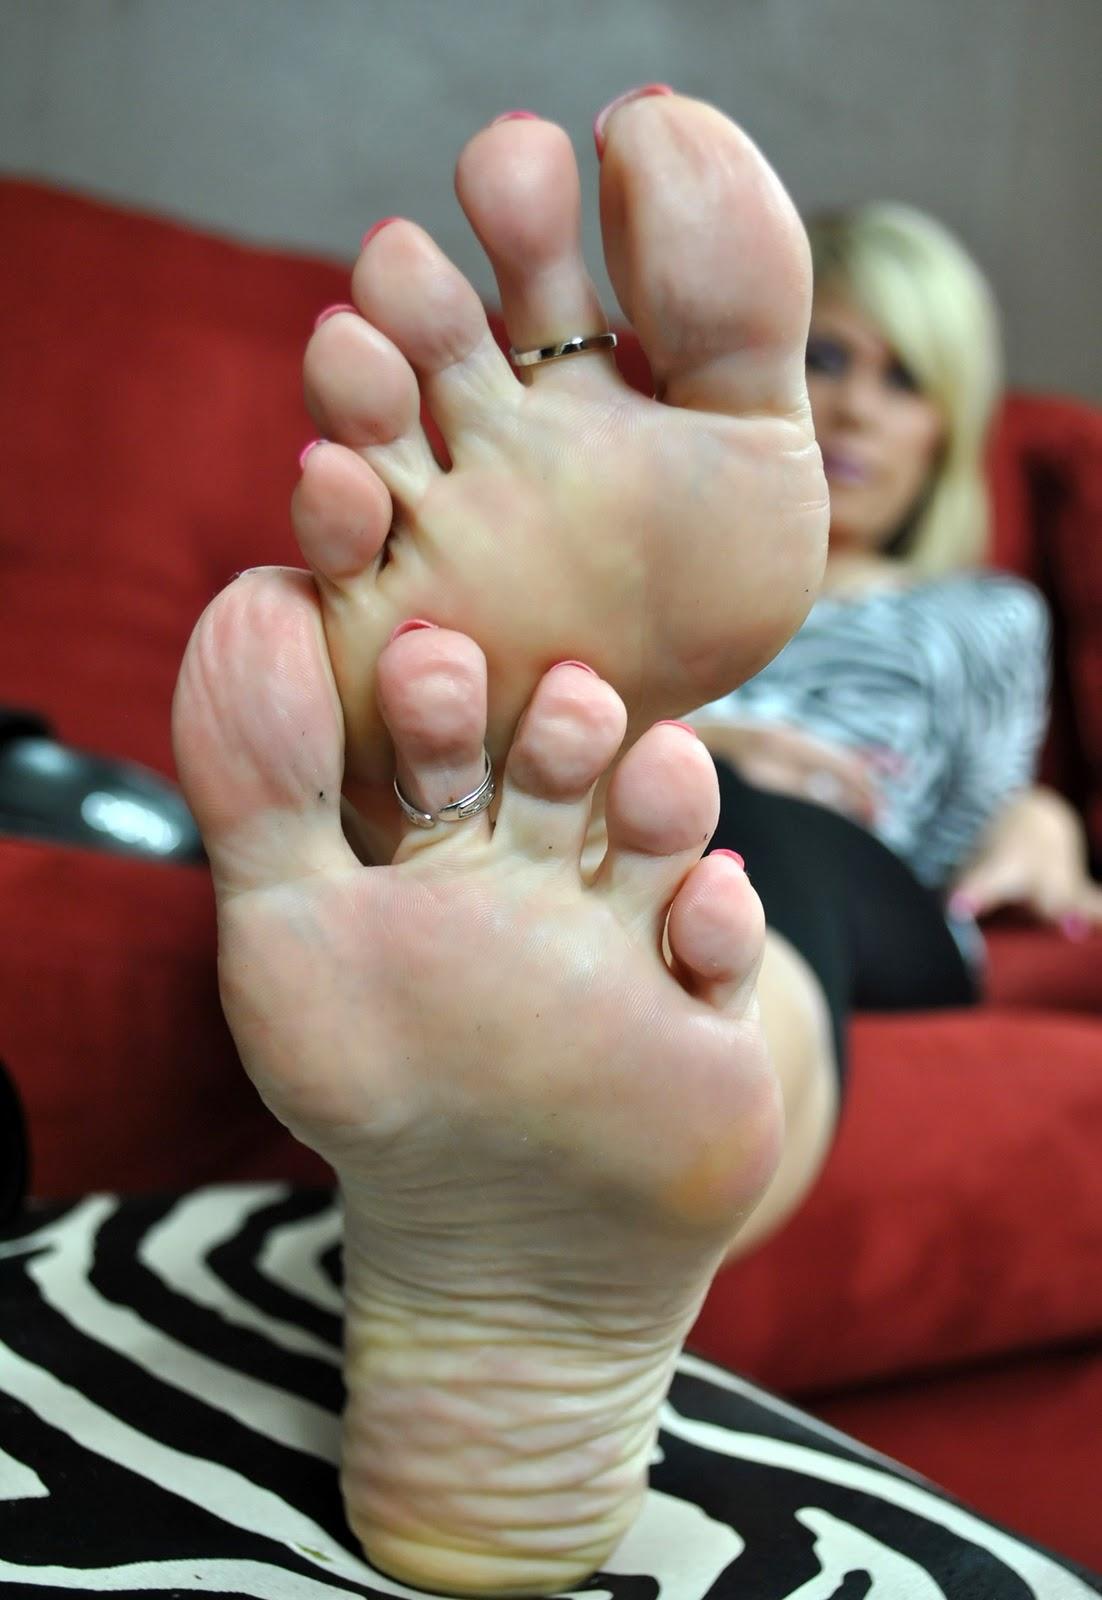 Angel kissed feet milf gets cummy feet from handjob footjob combination 6